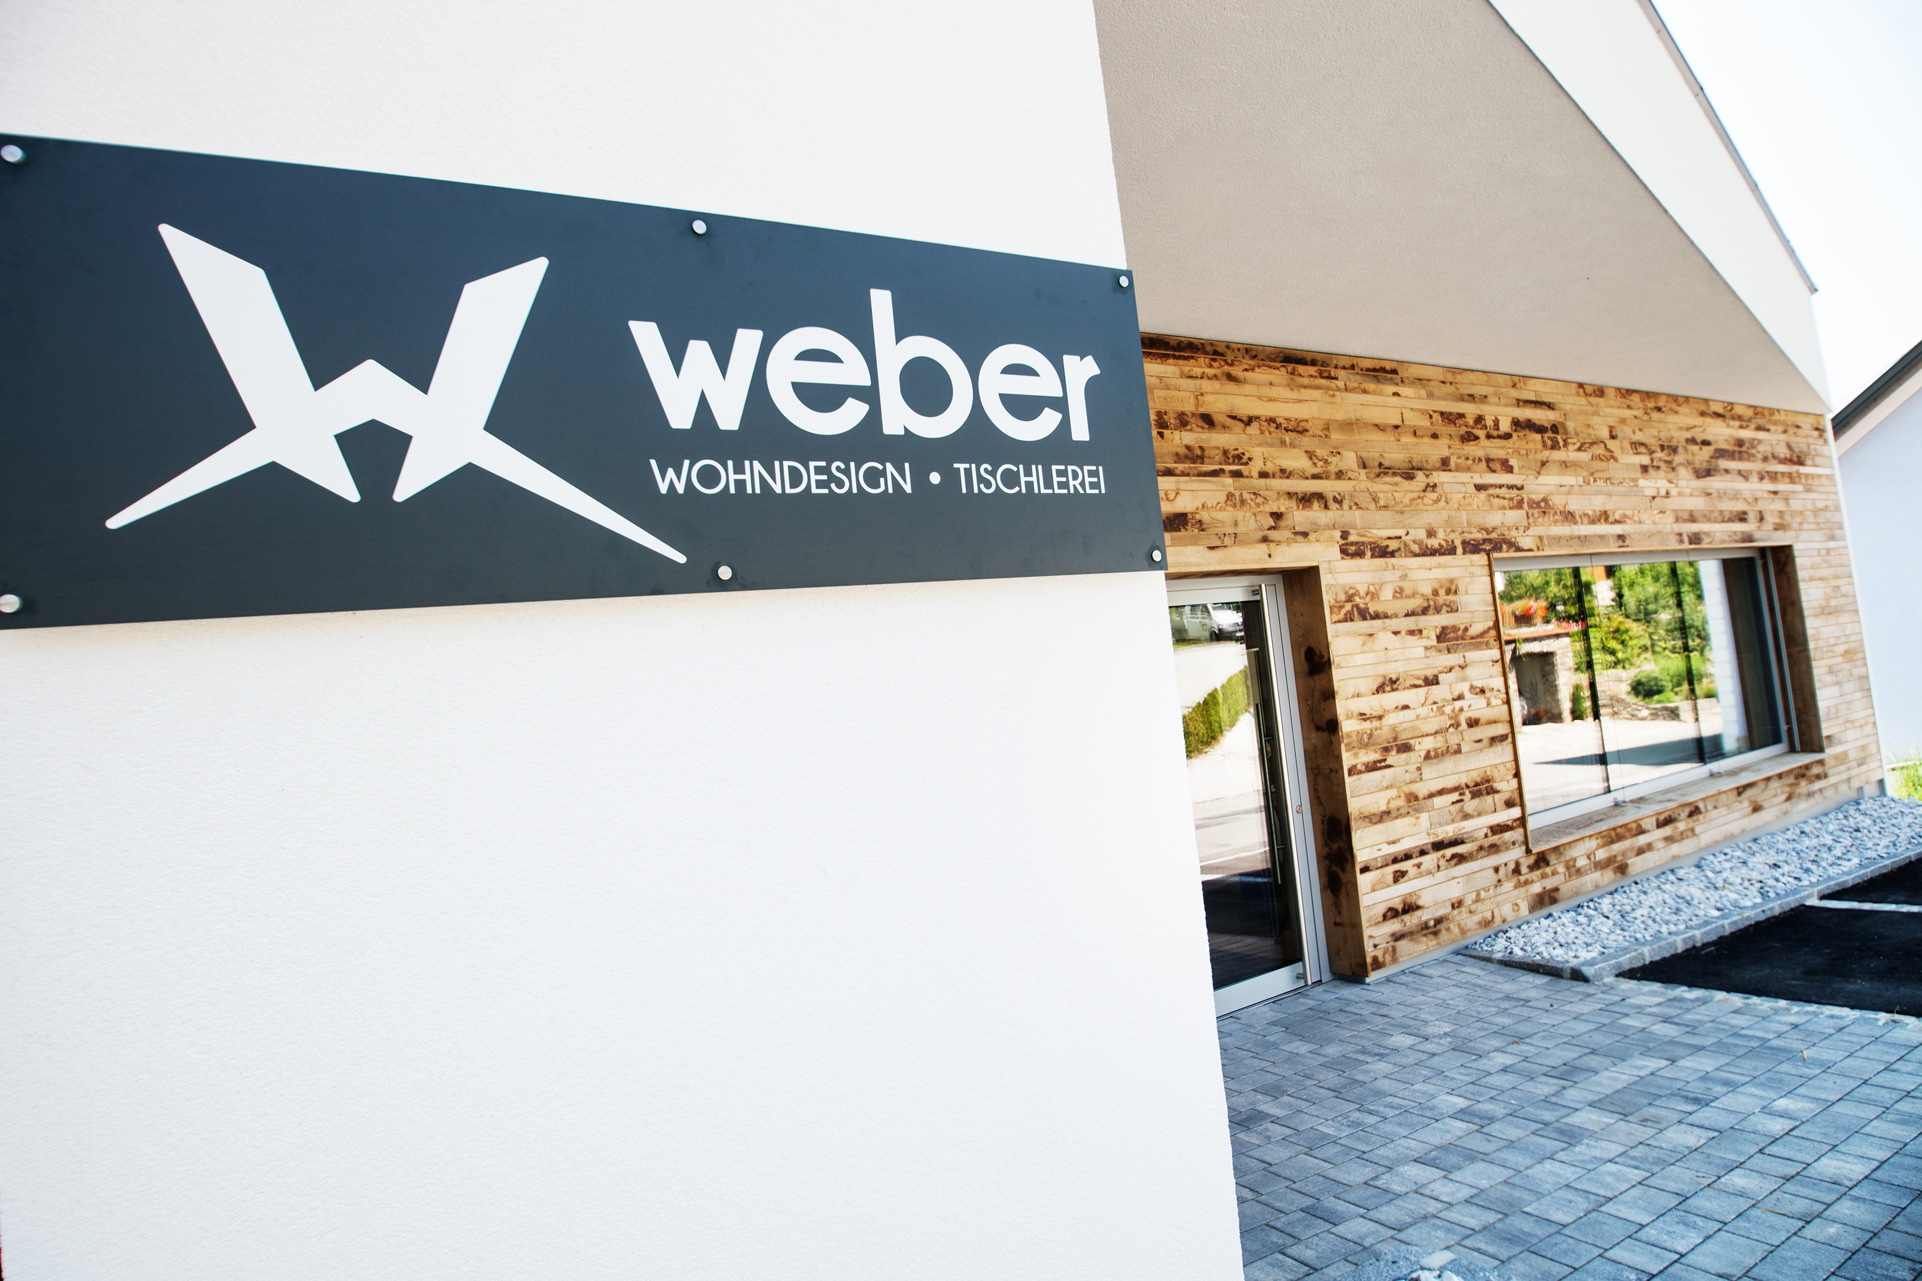 Tischlerei-Wohndesign WEBER